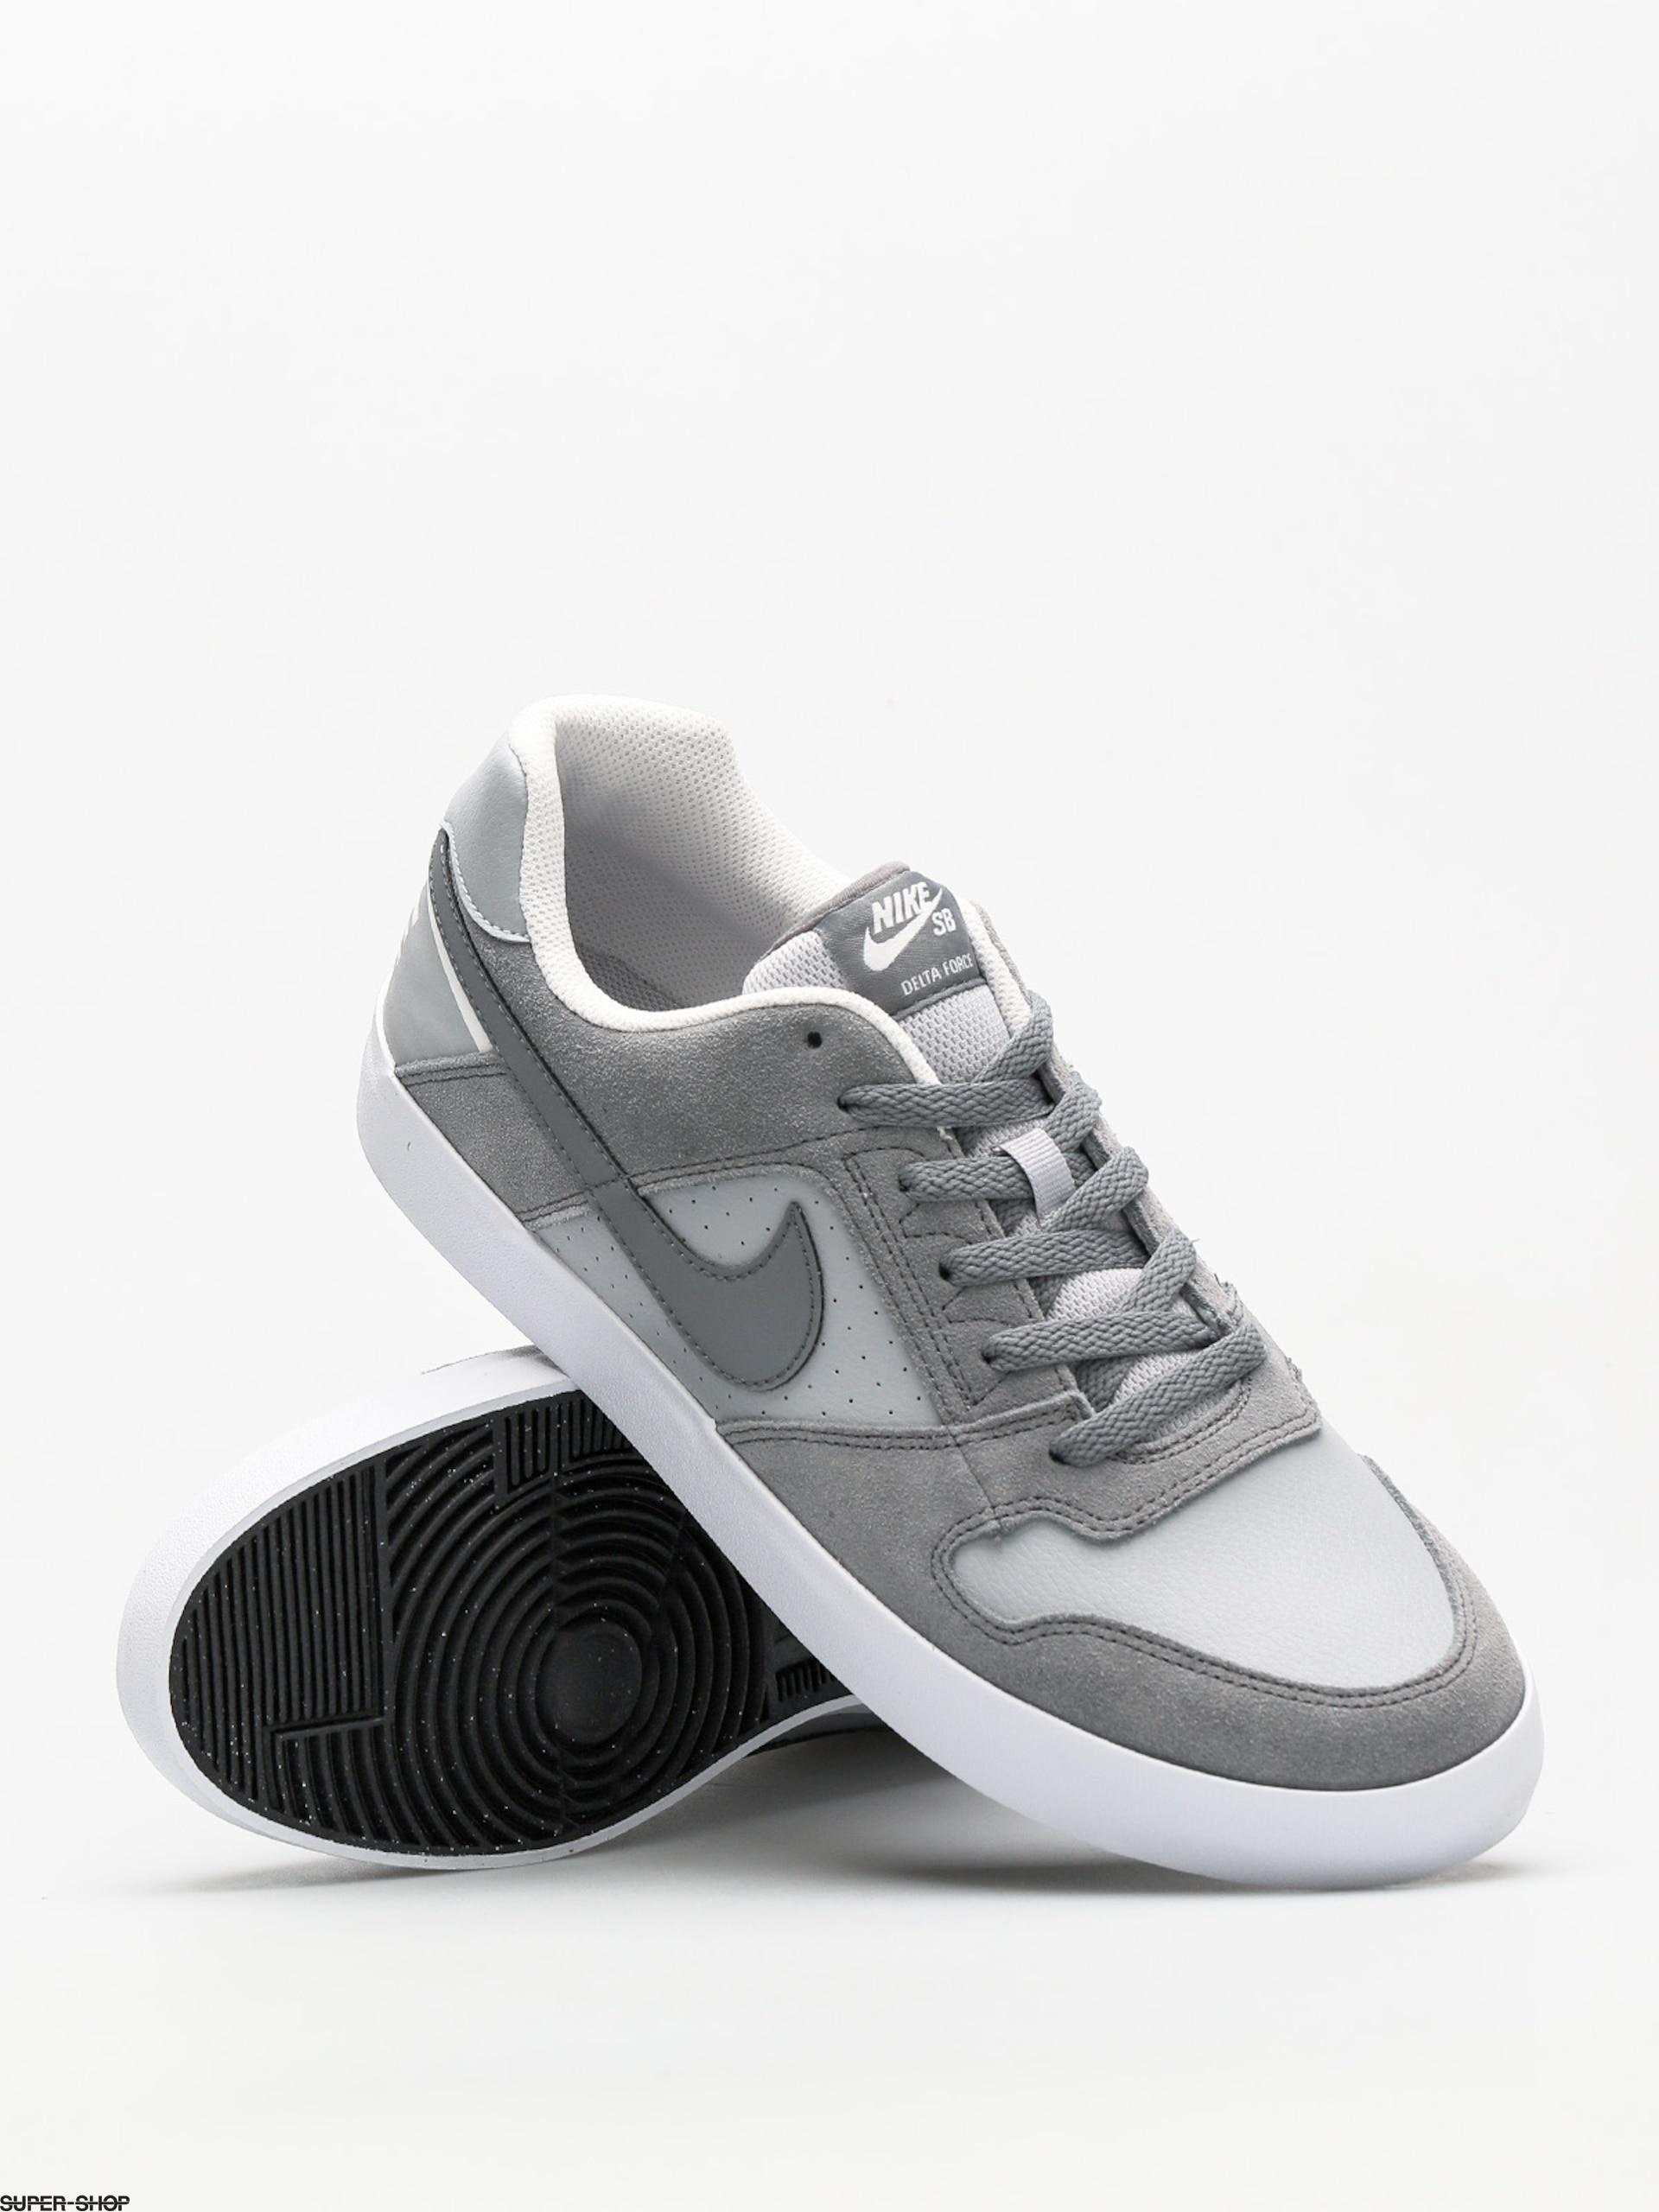 54a6d3cd2ff343 Nike SB Shoes Sb Delta Force Vulc (cool grey cool grey wolf grey white)